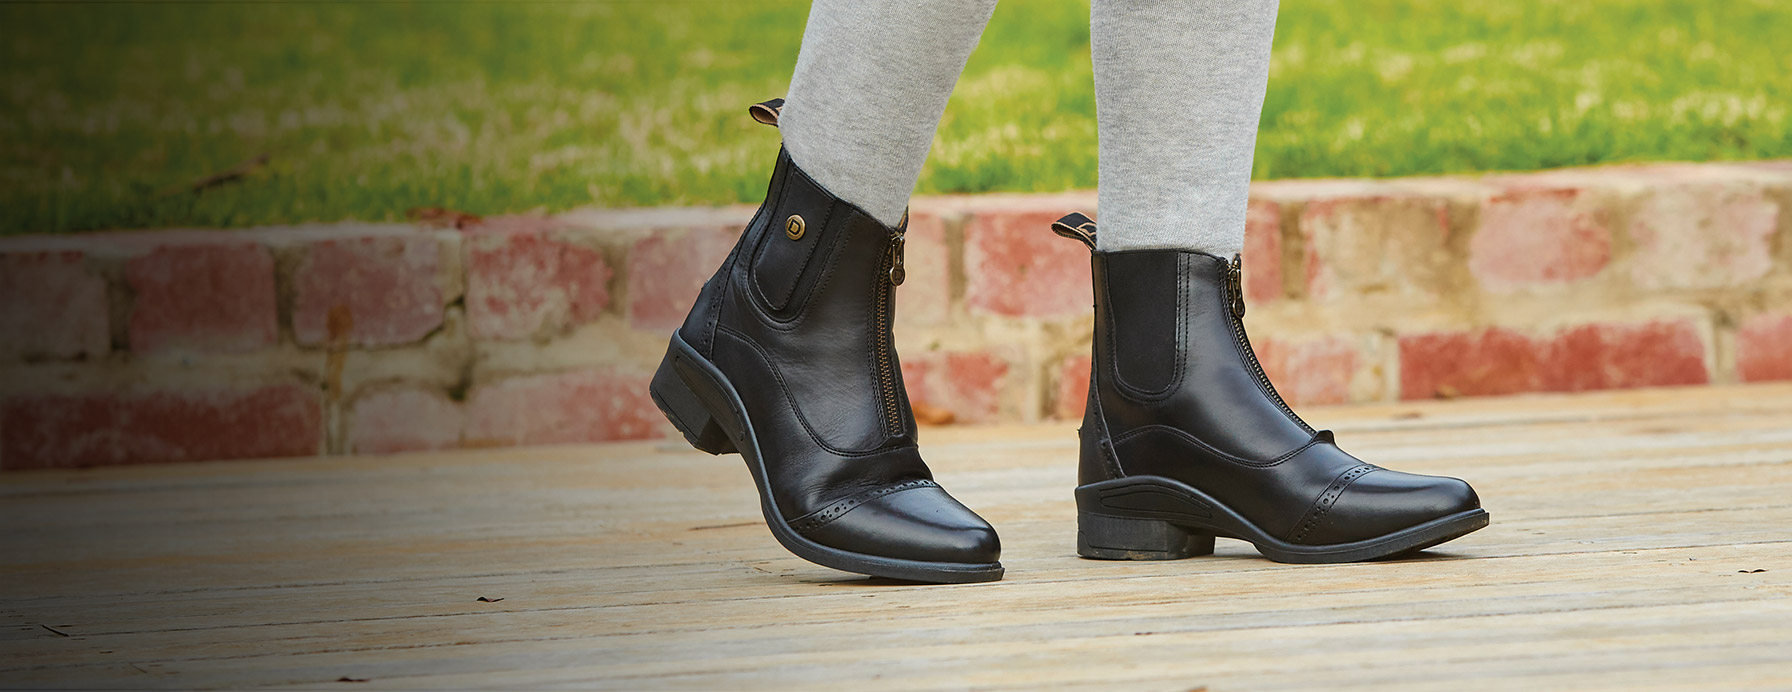 dublin jodhpur and paddock boots